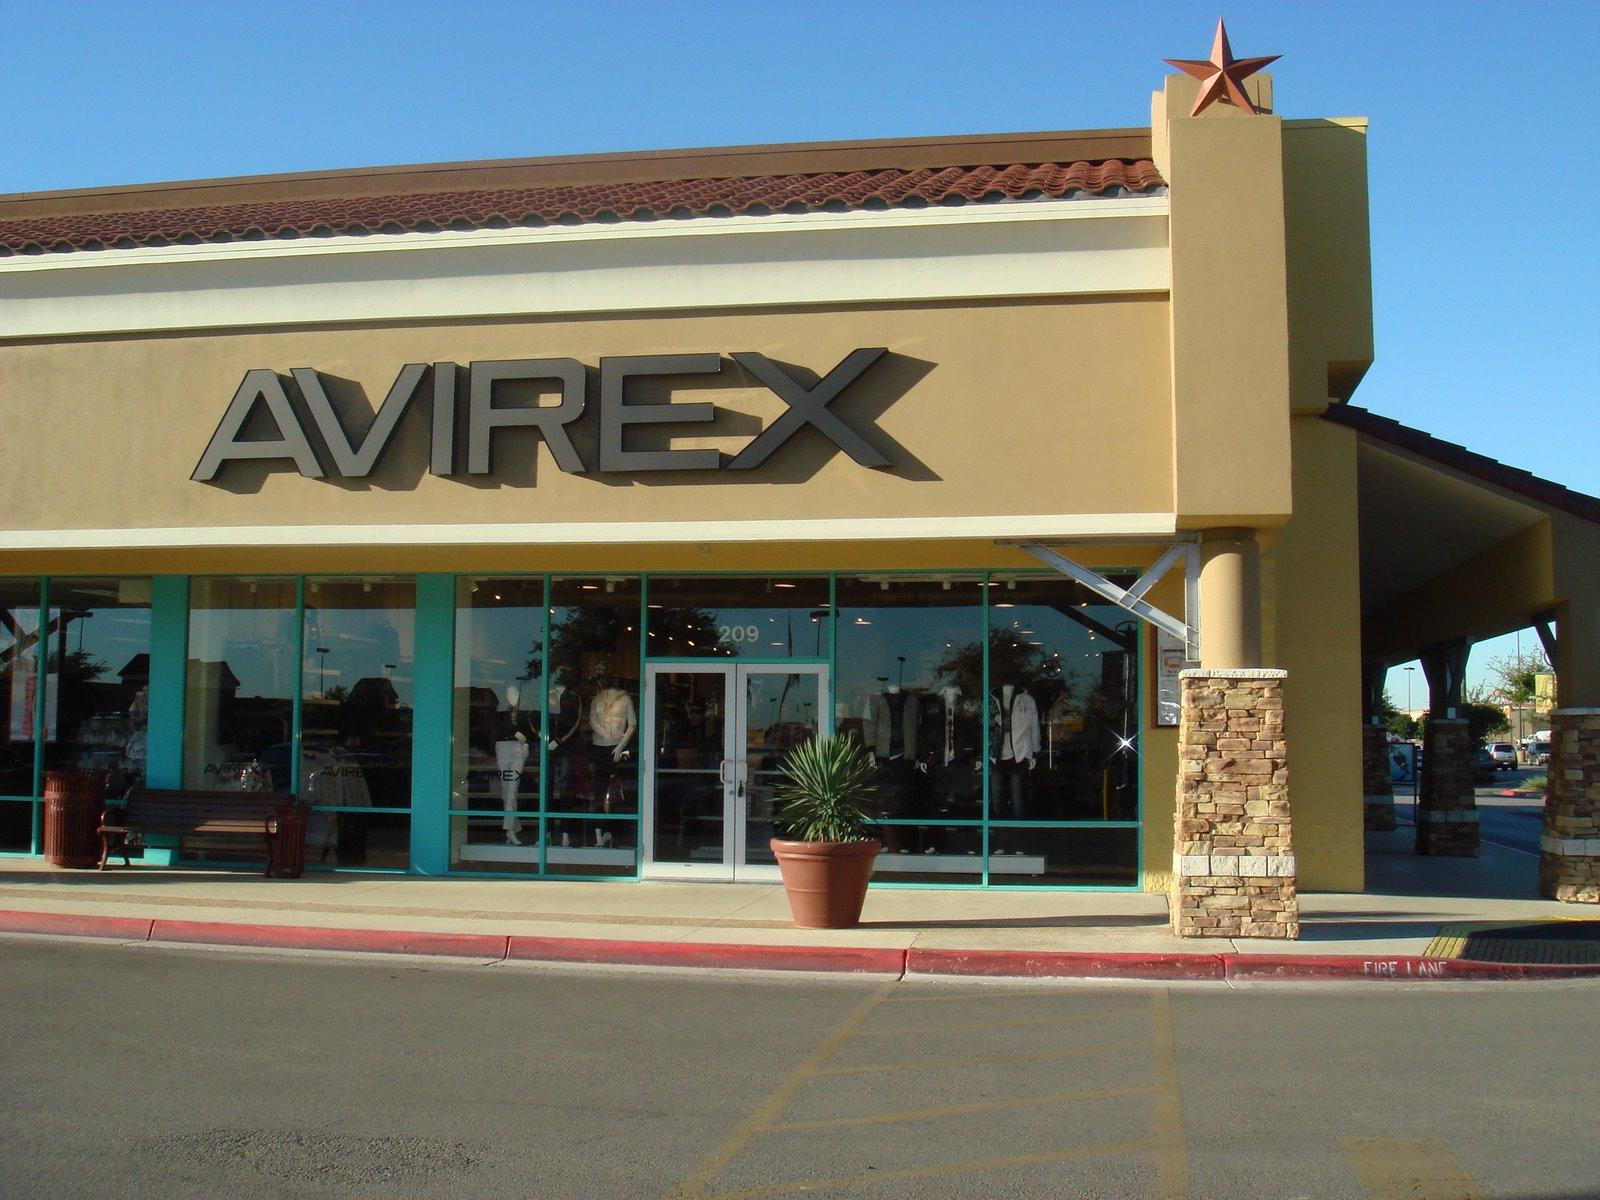 AVIREX NEWS: AVIREX STORE GRAND OPENING SAN MARCOS, TX